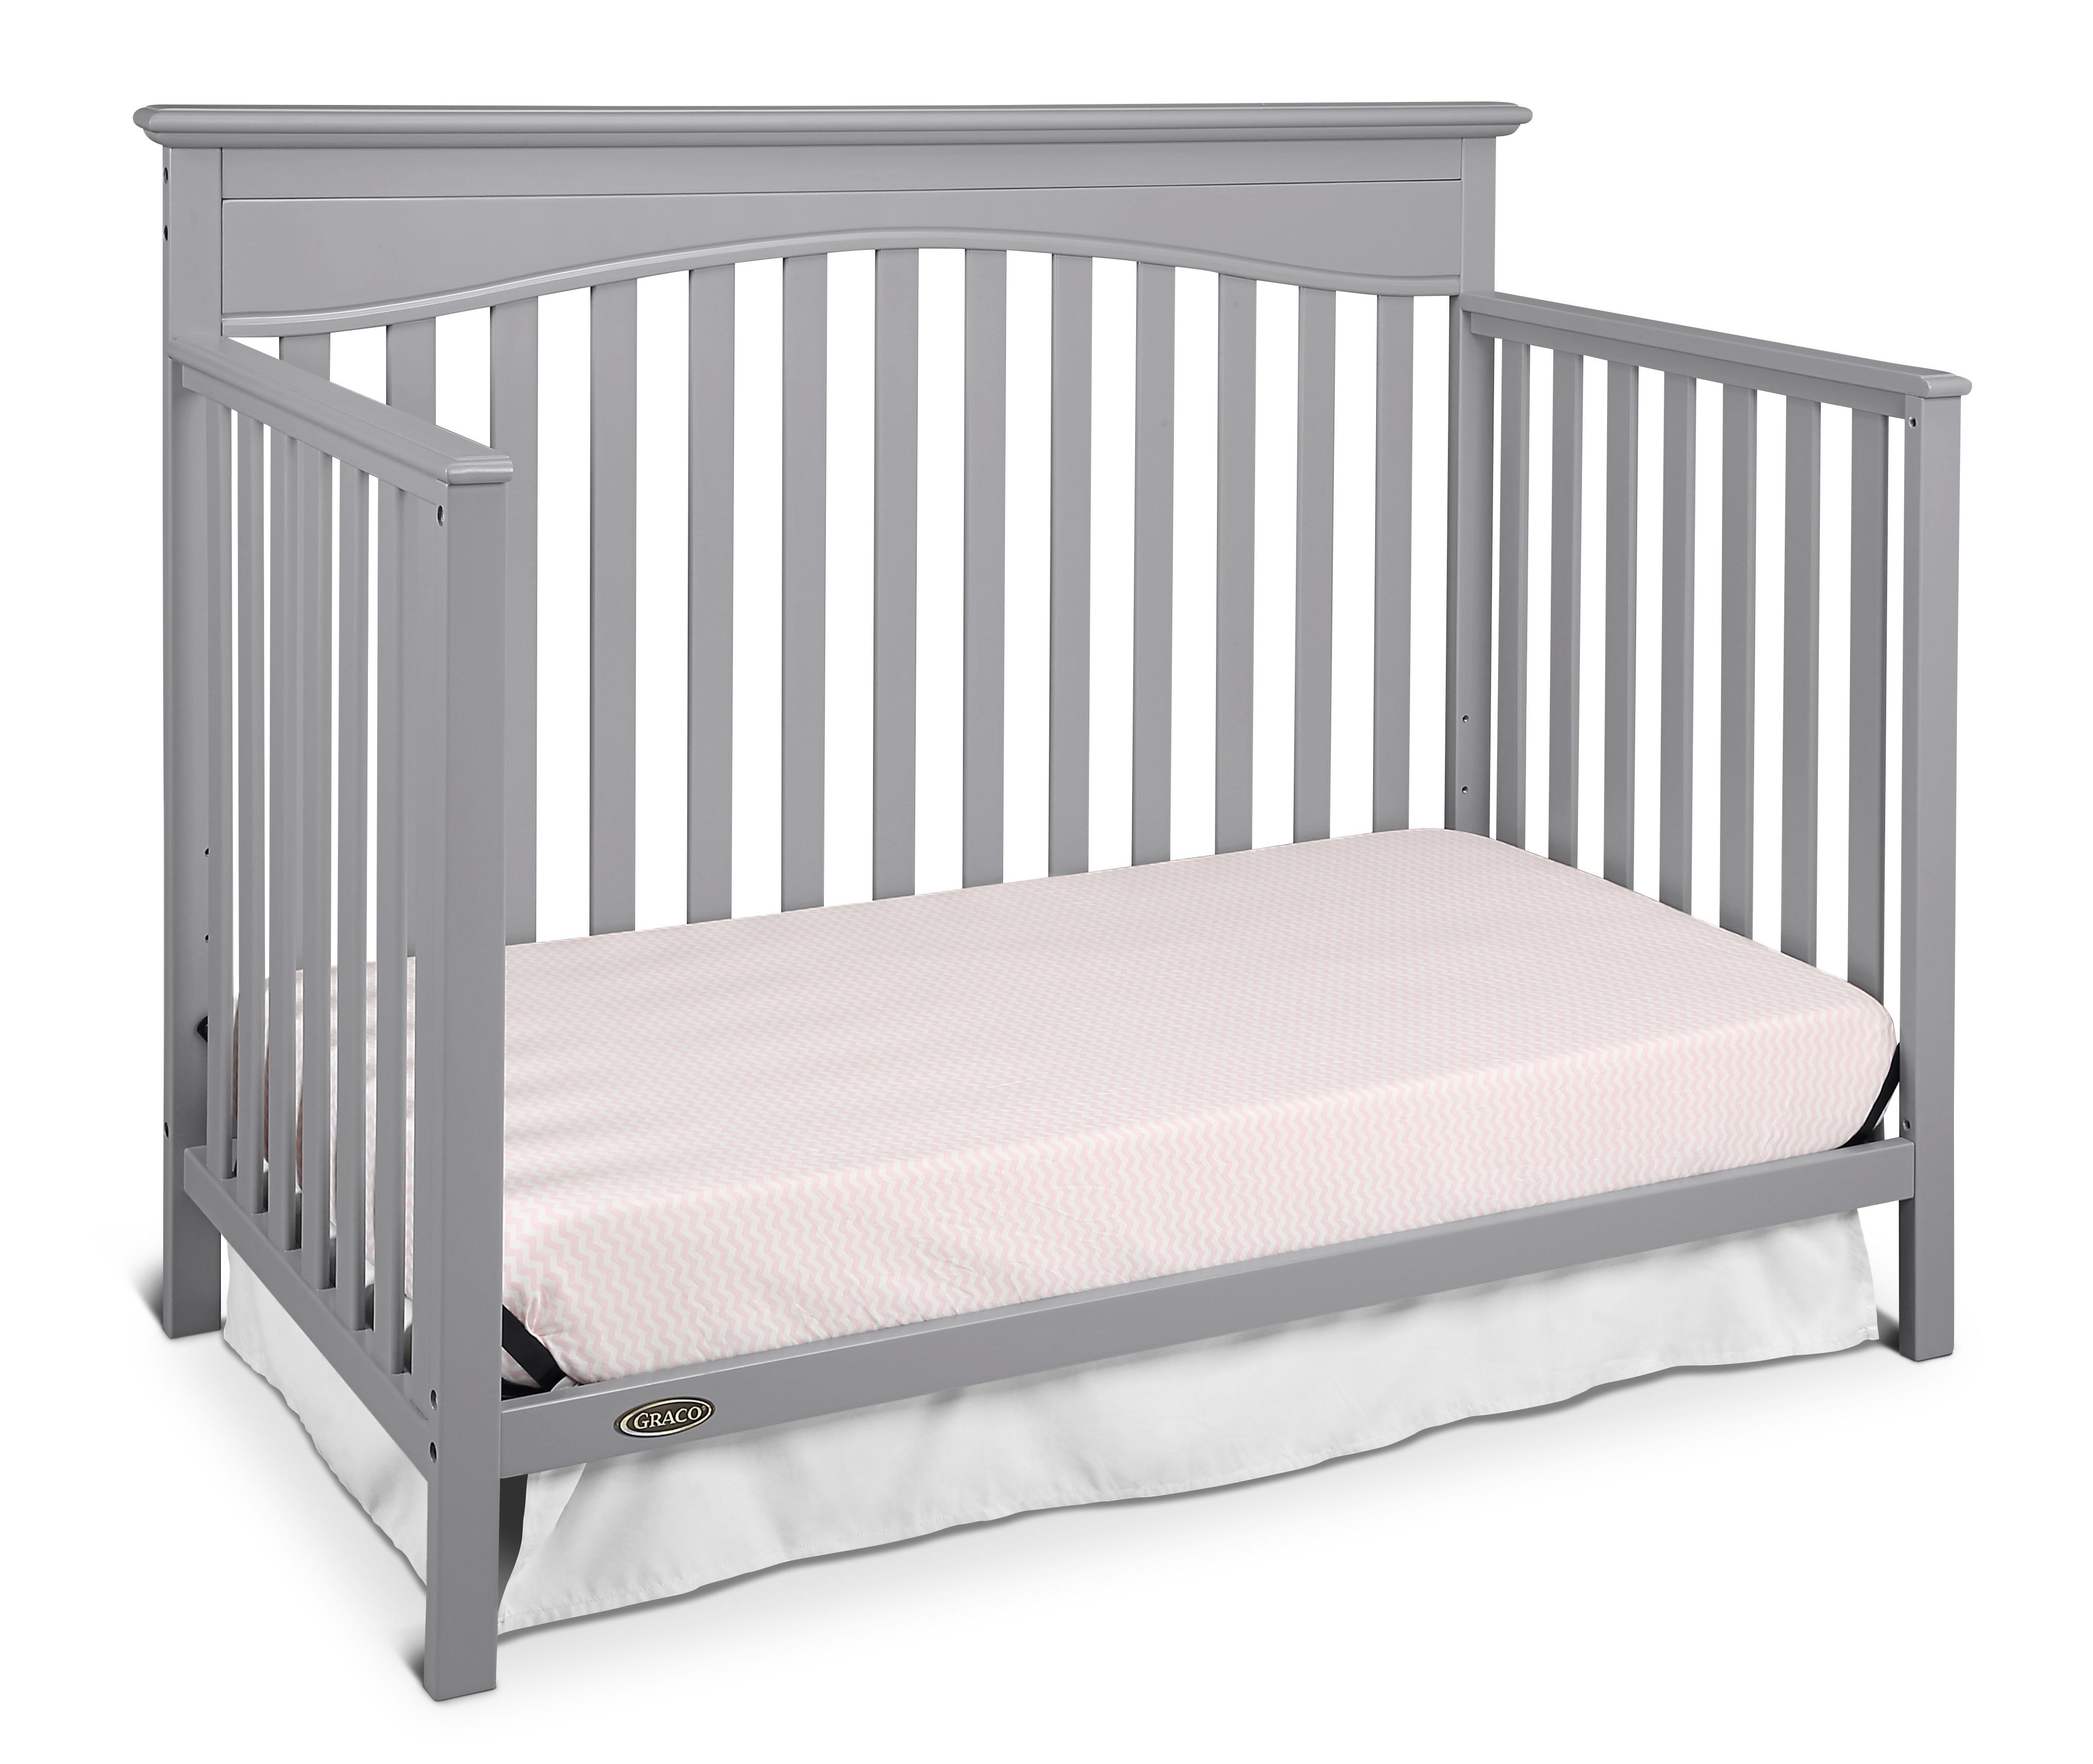 Graco Convertible Crib Toddler Rail